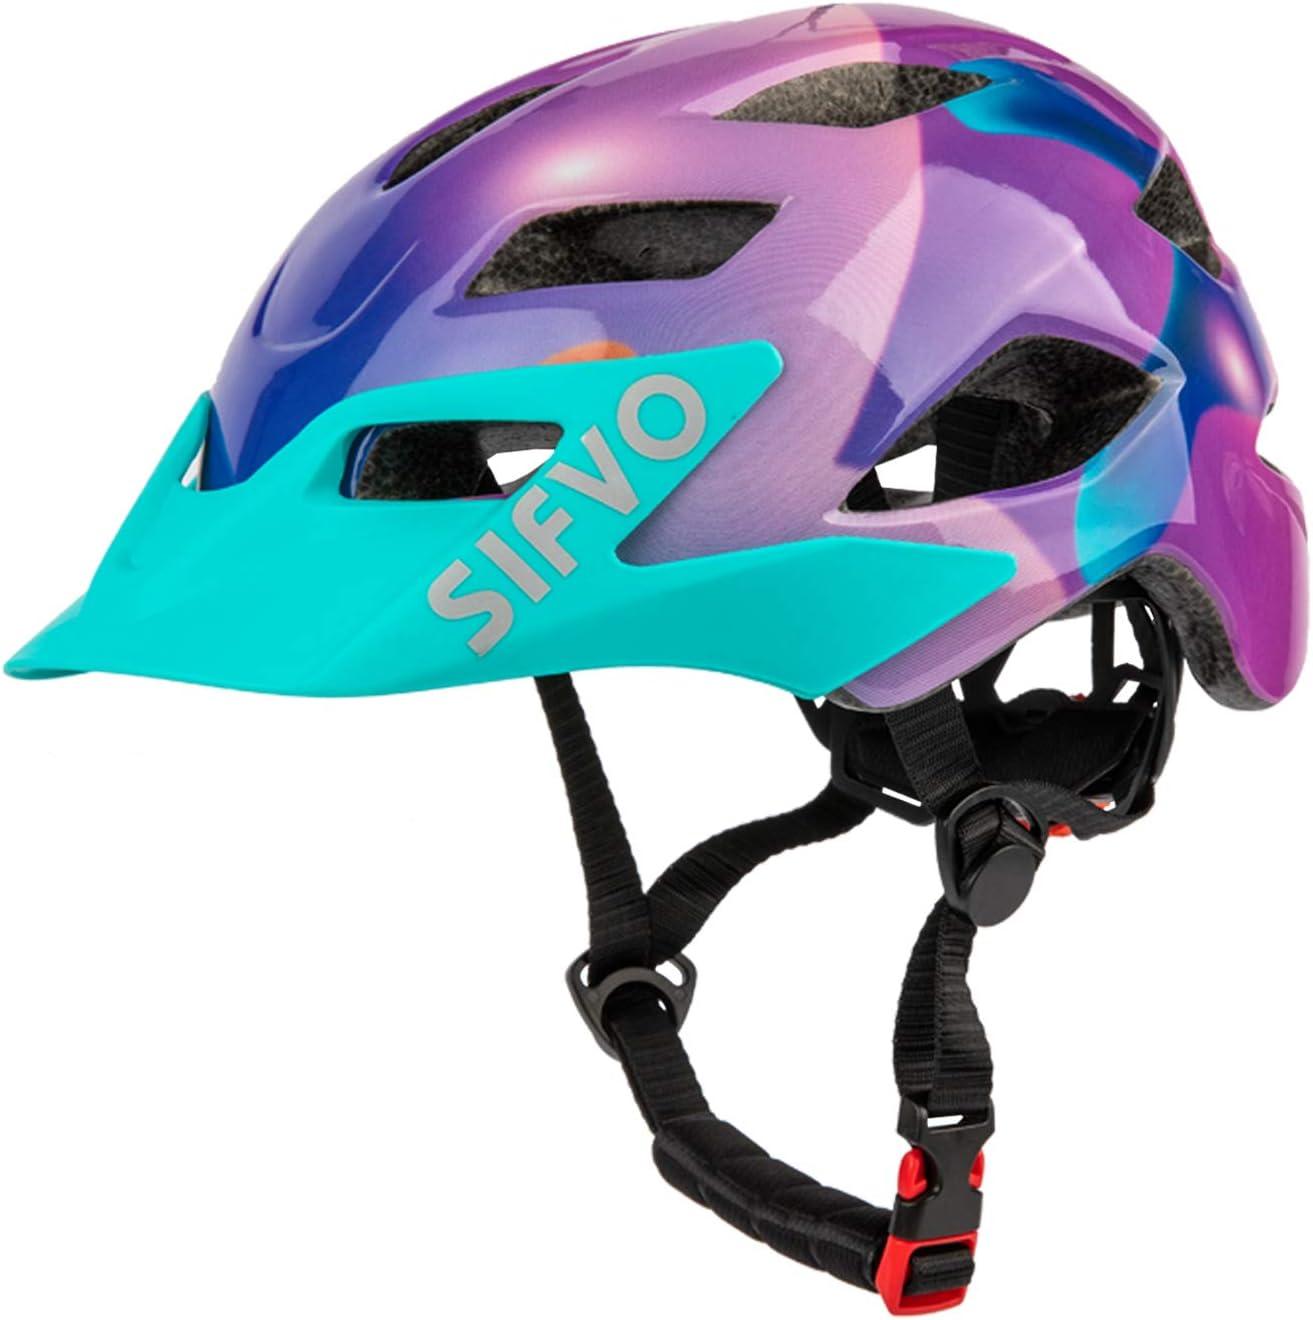 SIFVO Kids Bike Helmet, Youth Roller Skate Helmet,Bicycle Helmets Sports Helmets for Boys and Girls Aged 5-13 50-57cm